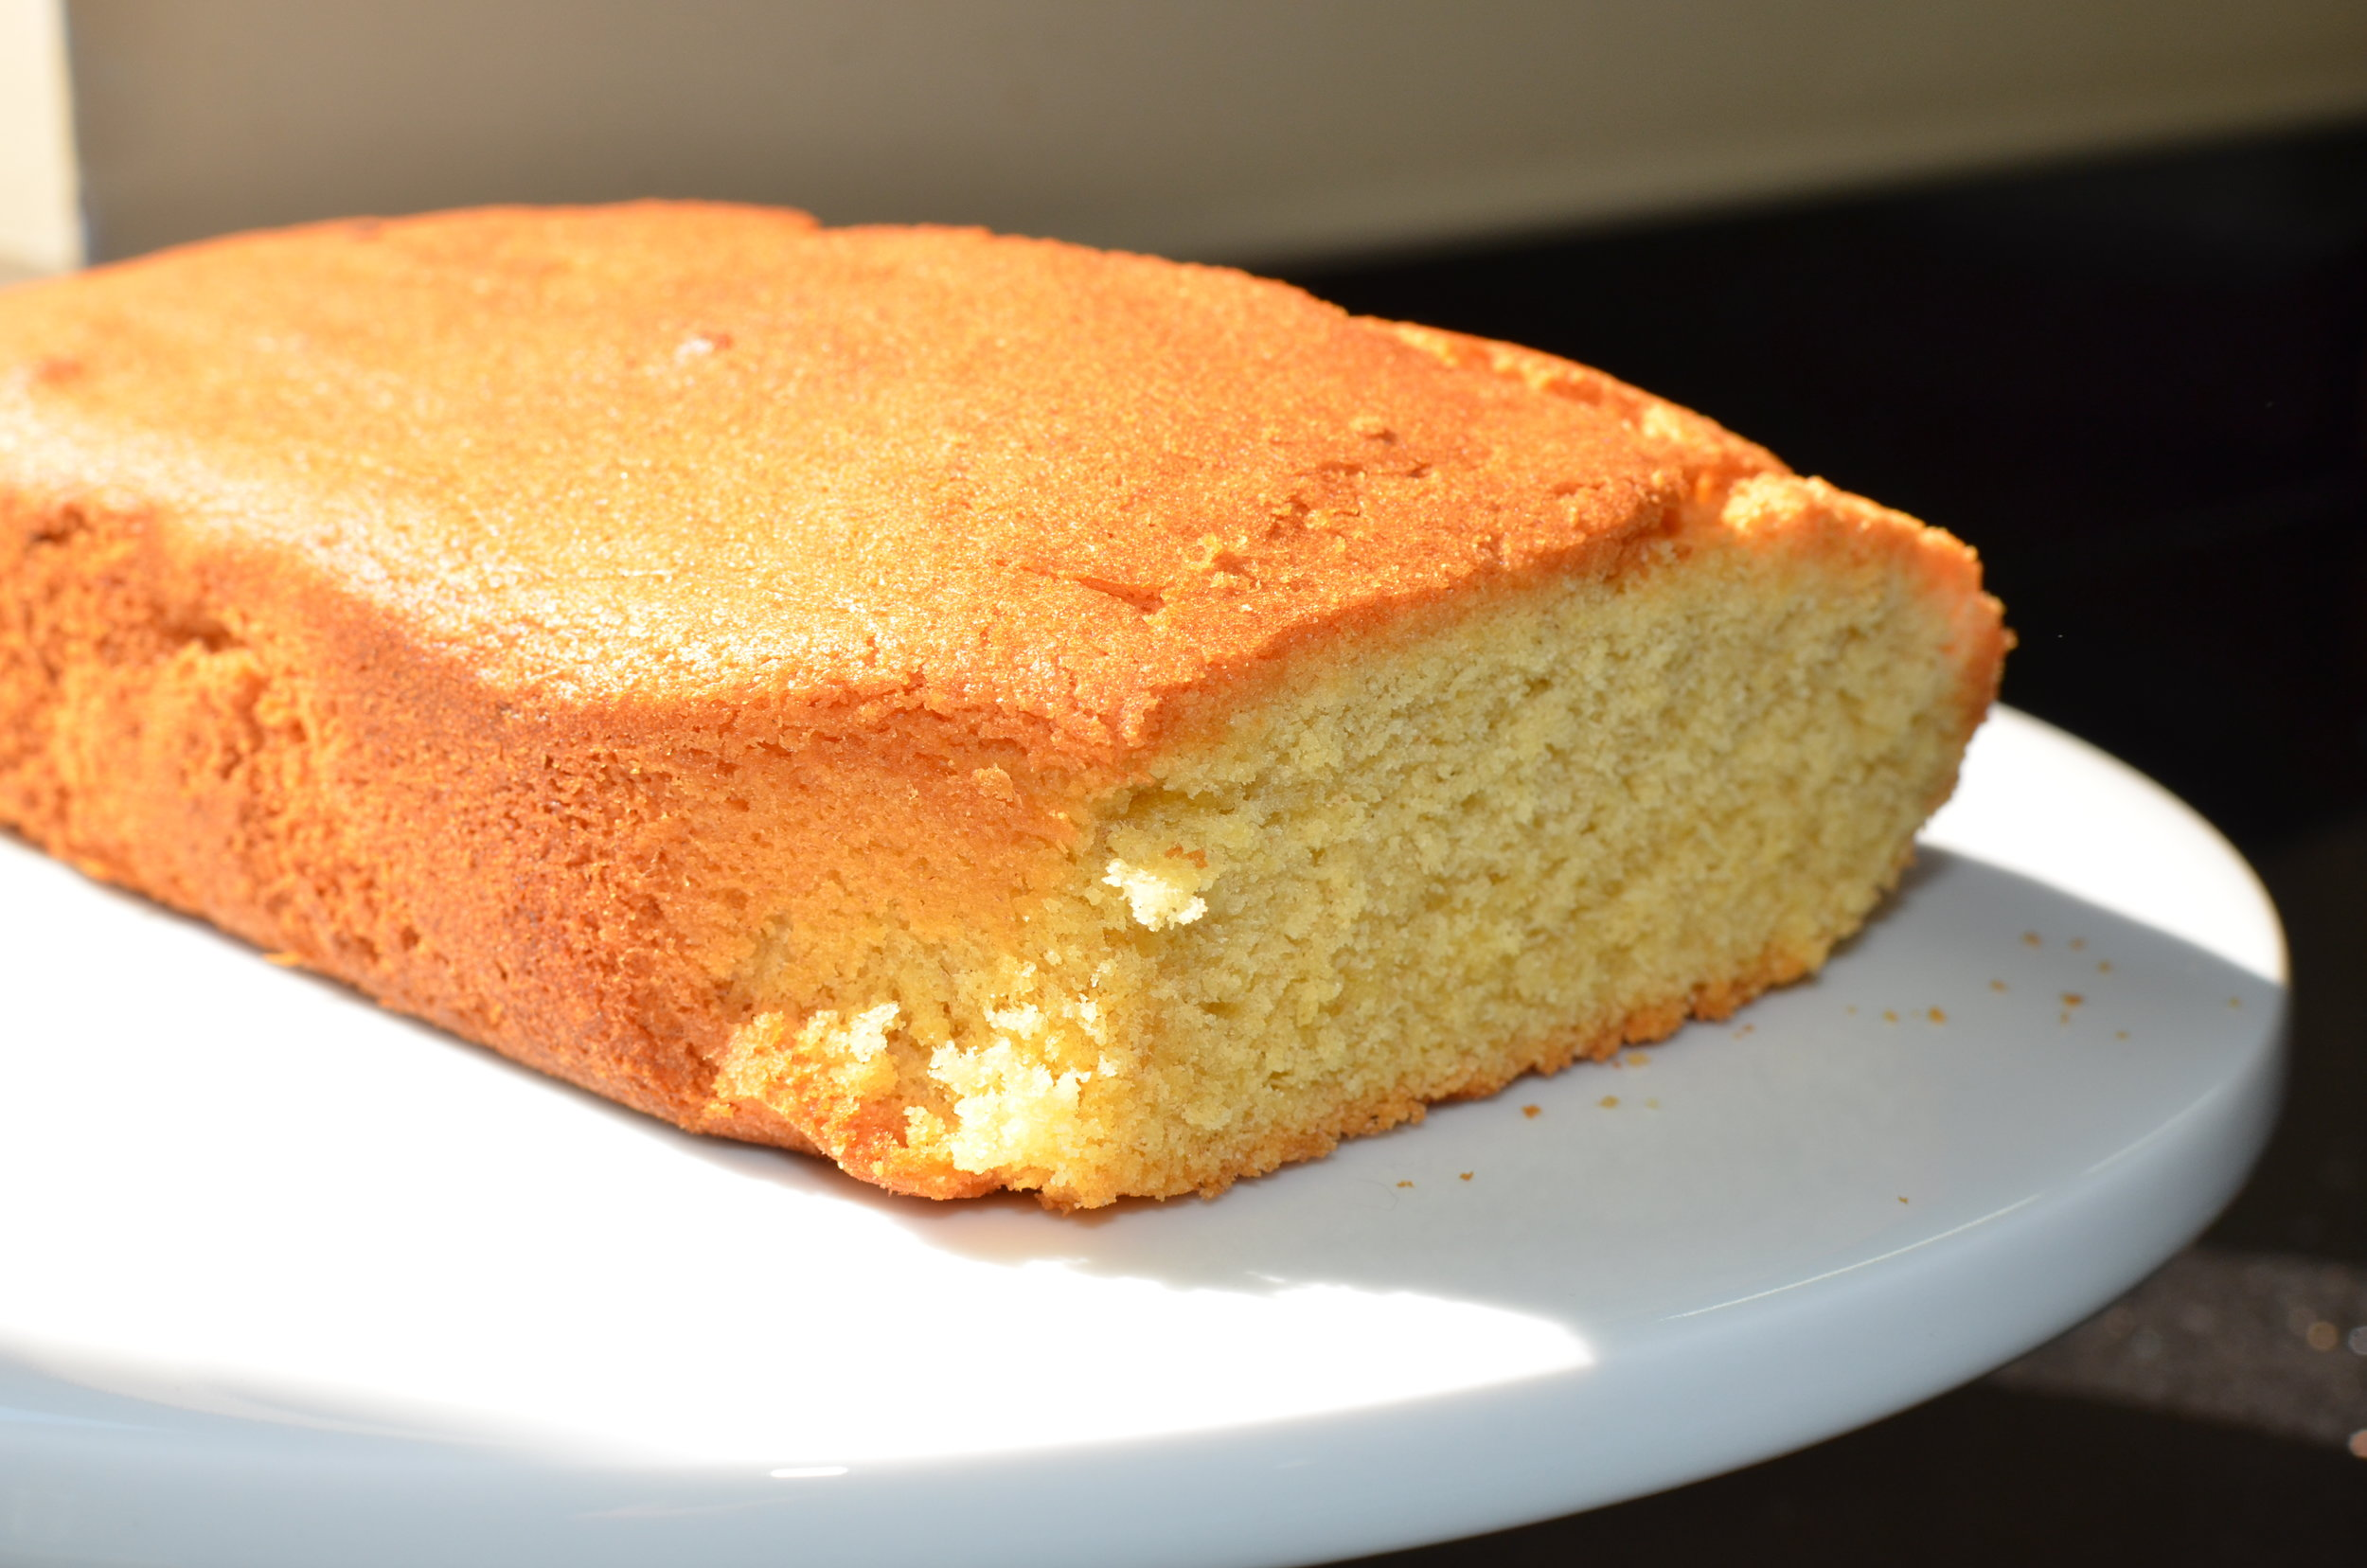 Delia Smith's Madeira cake recipe